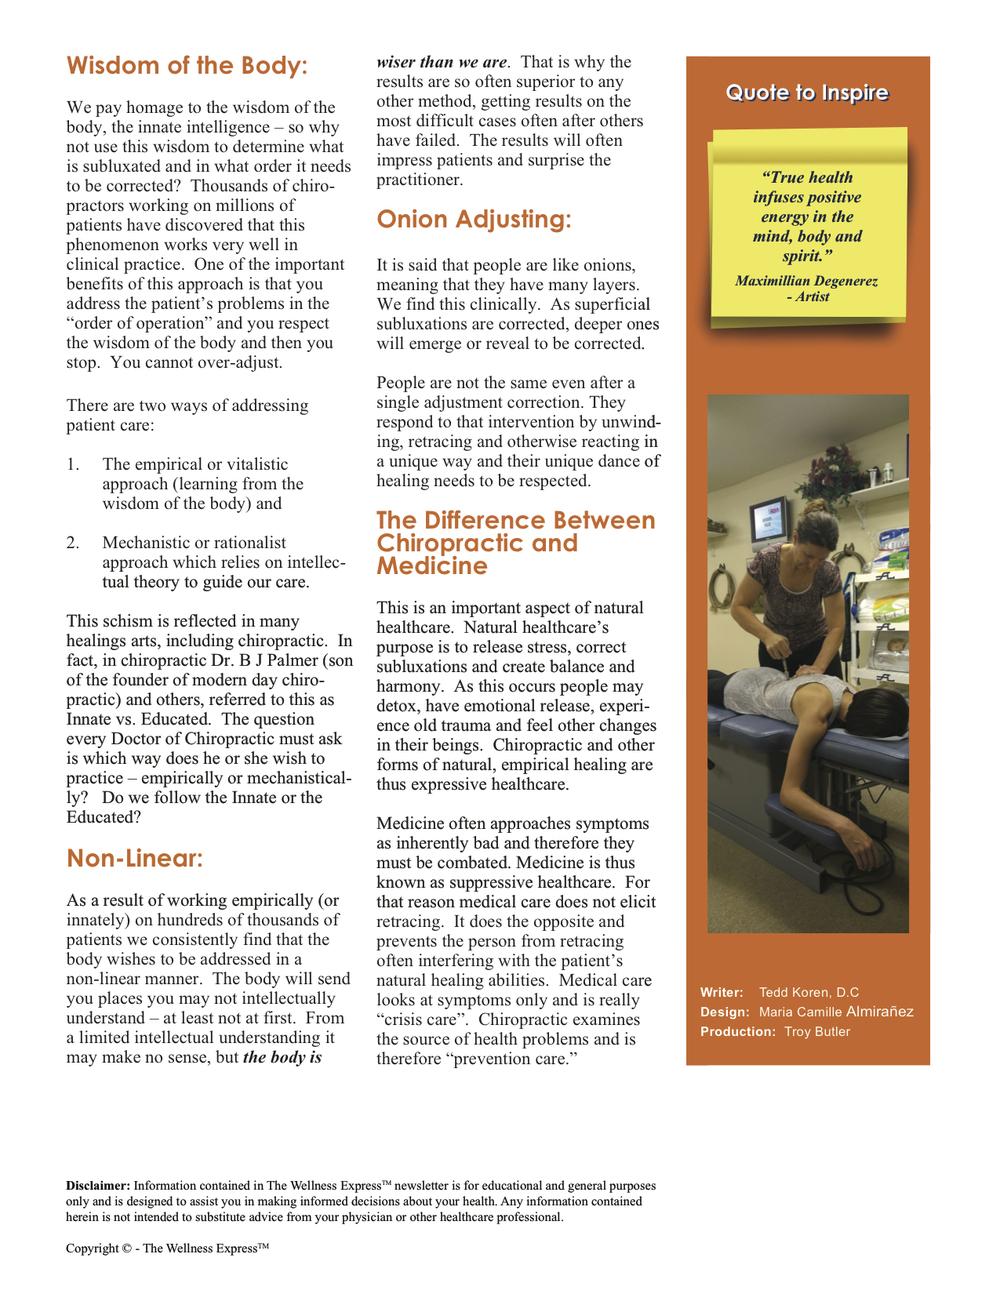 Advanced Wellness Newsletter: Locks and Onions